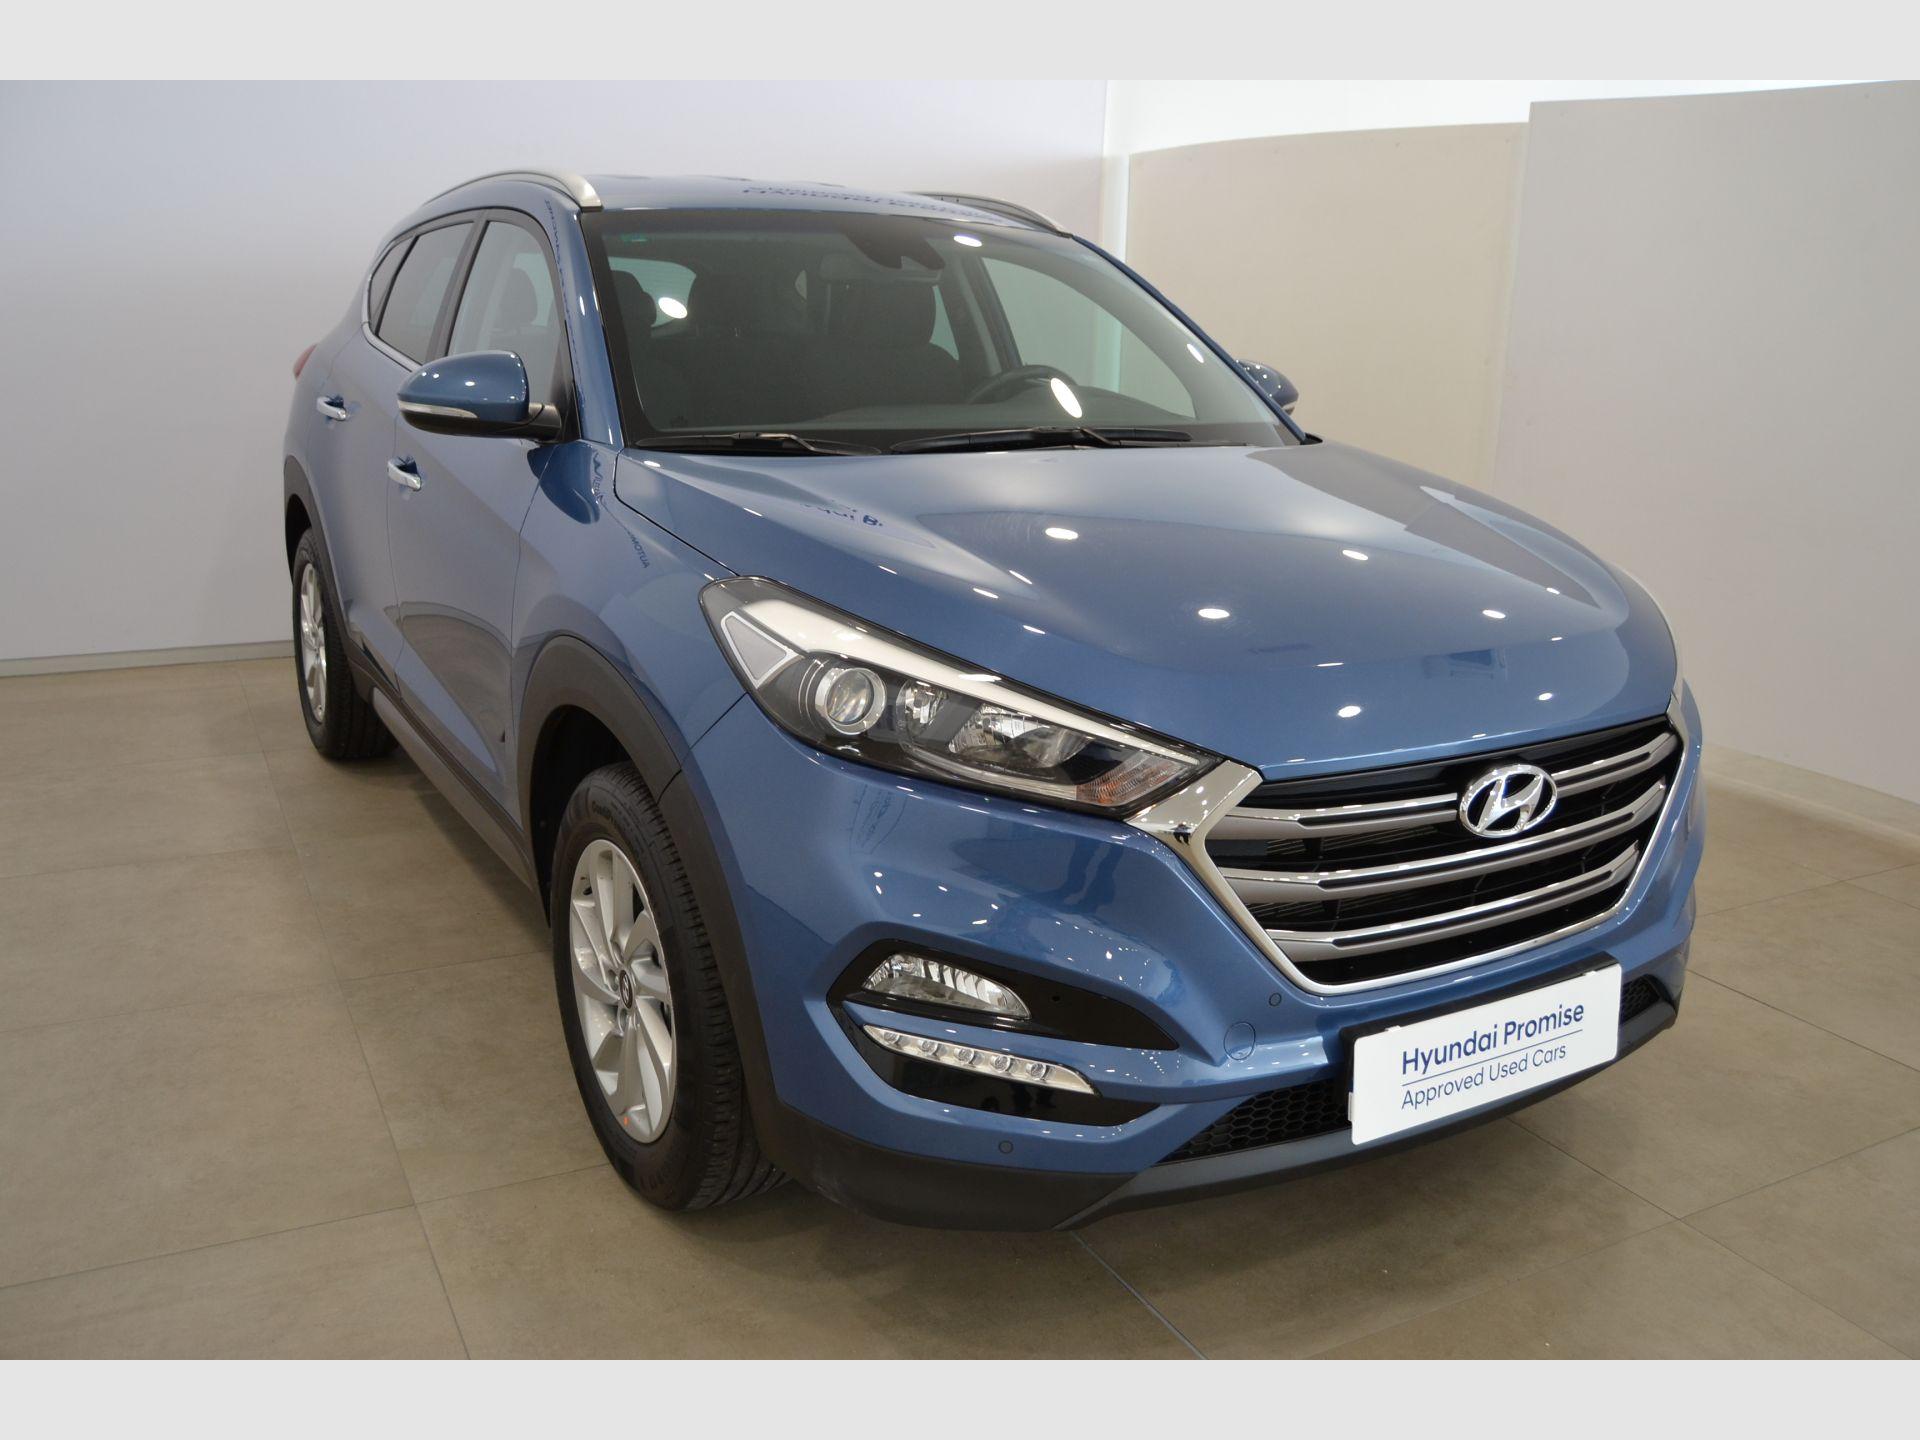 Hyundai Tucson 1.6 GDi BlueDrive Tecno 4x2